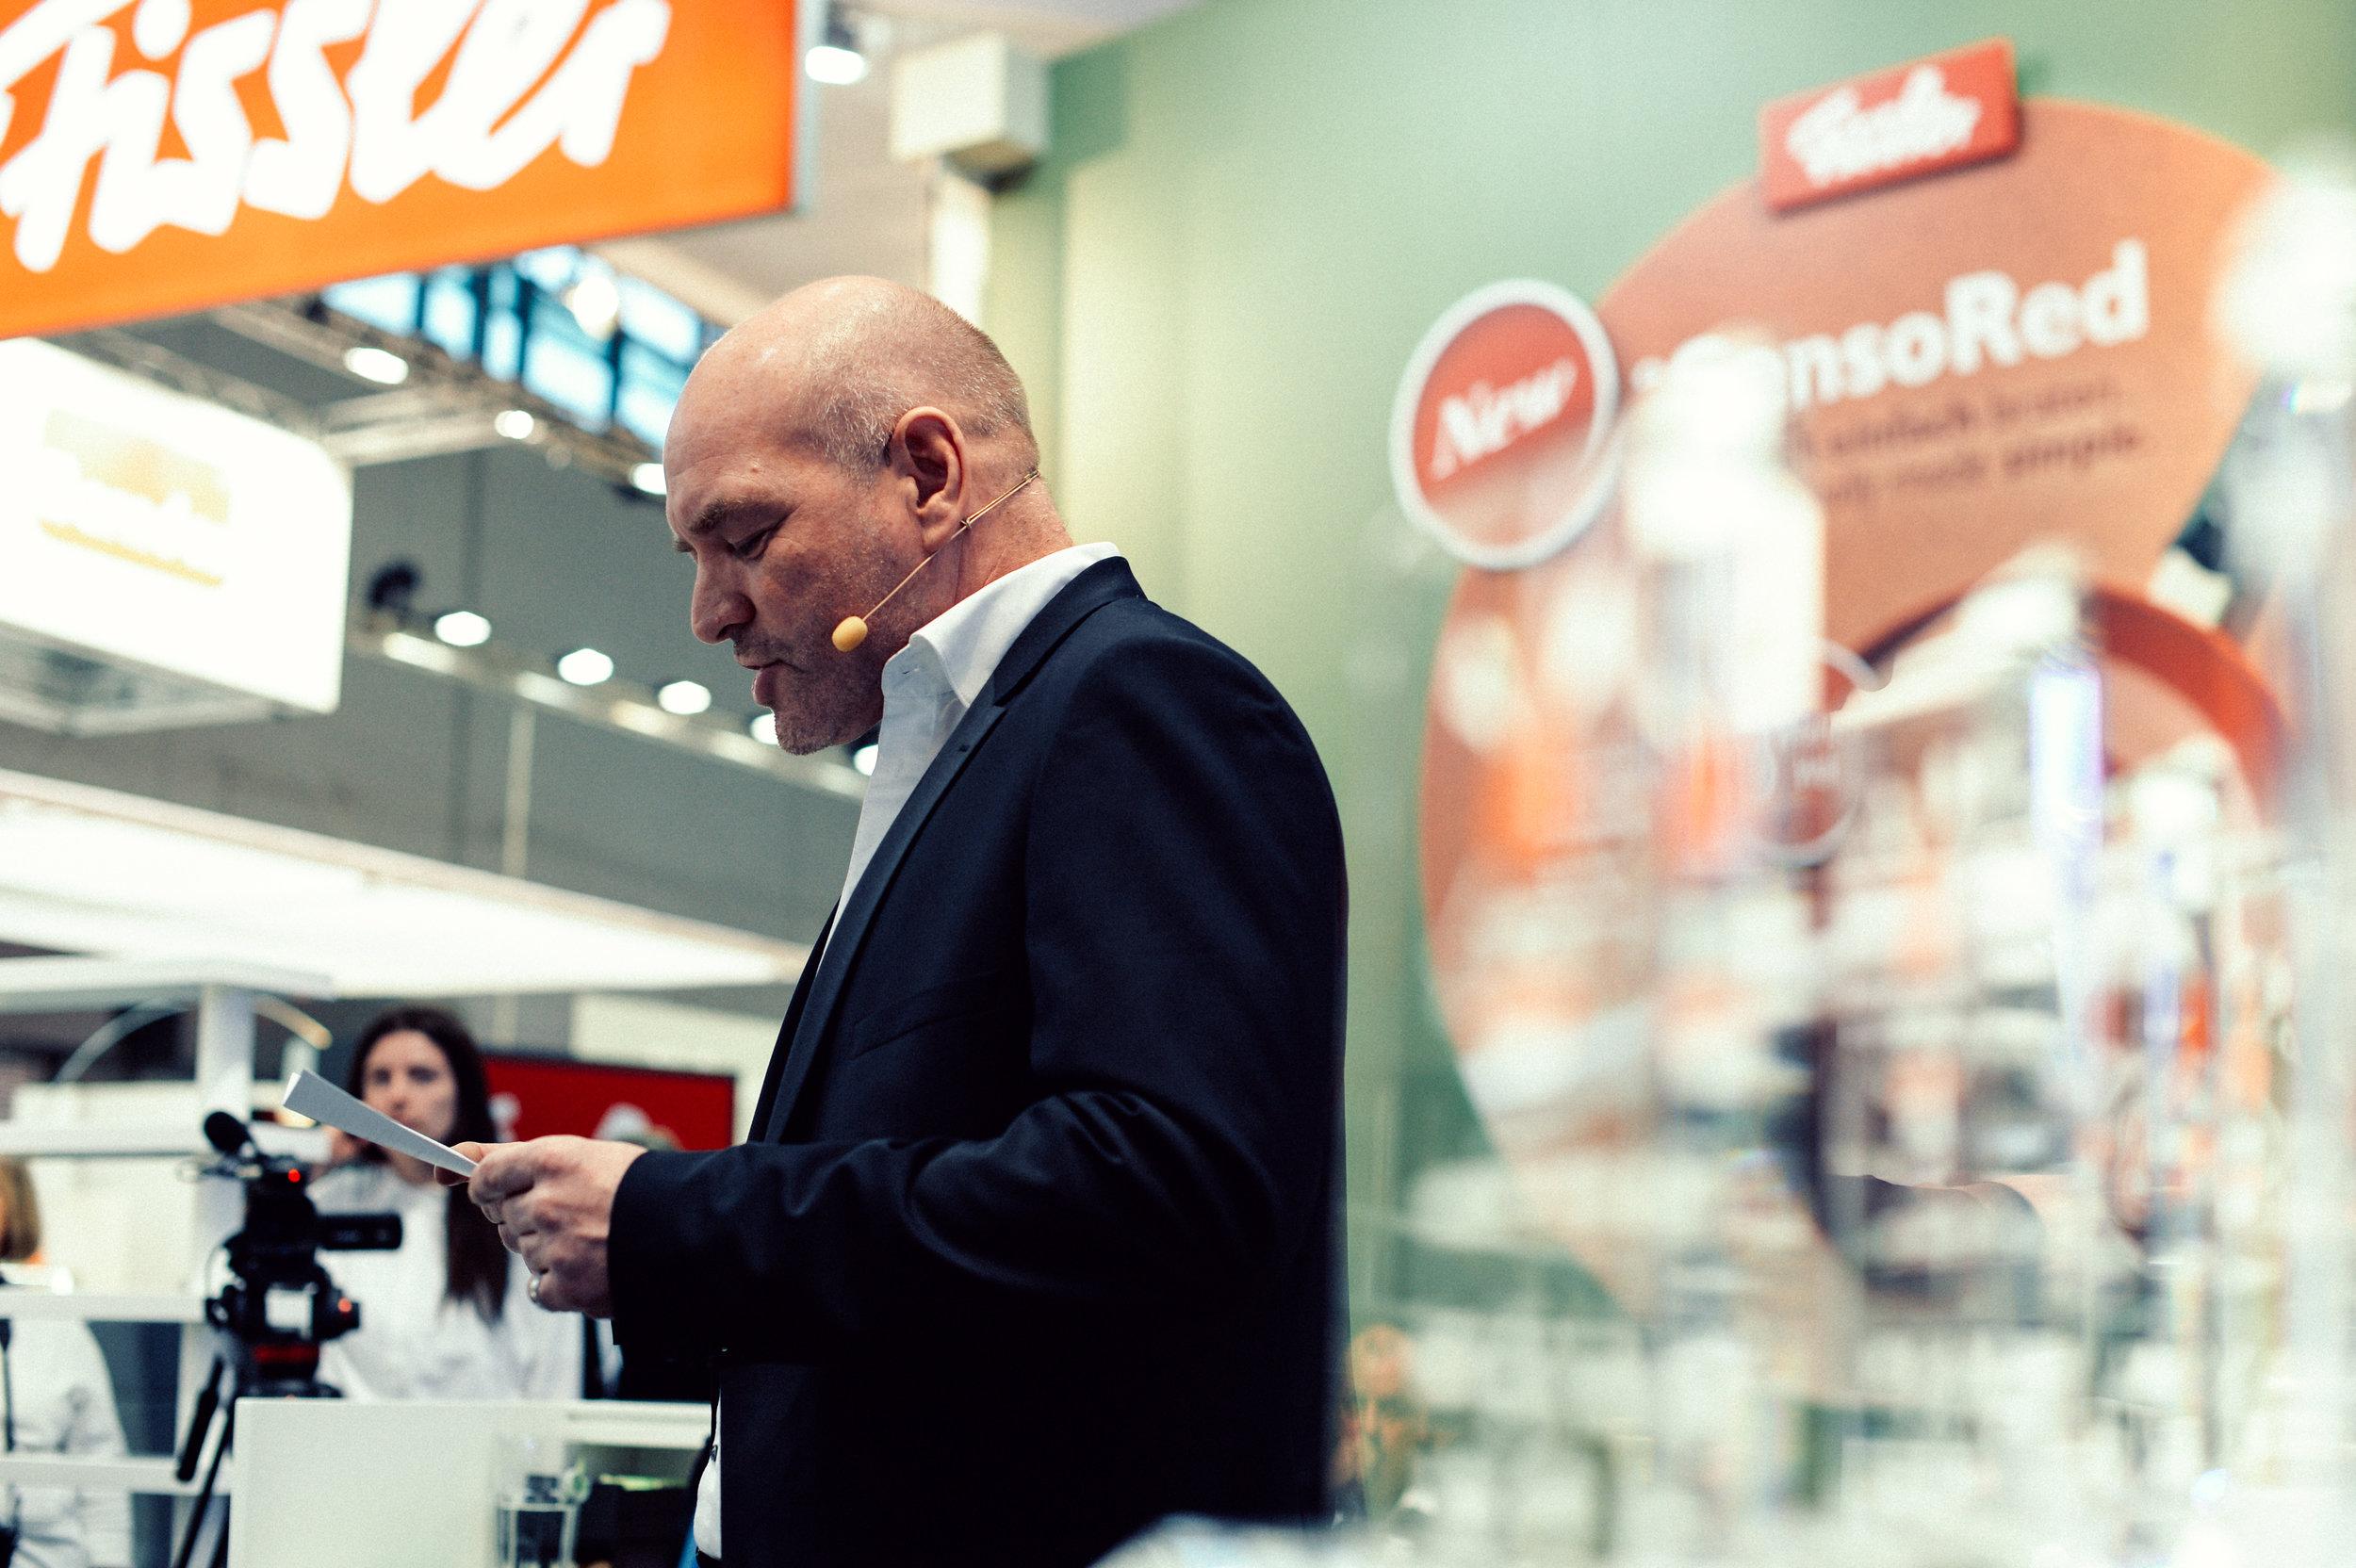 german_food_blog_contest-8.jpg